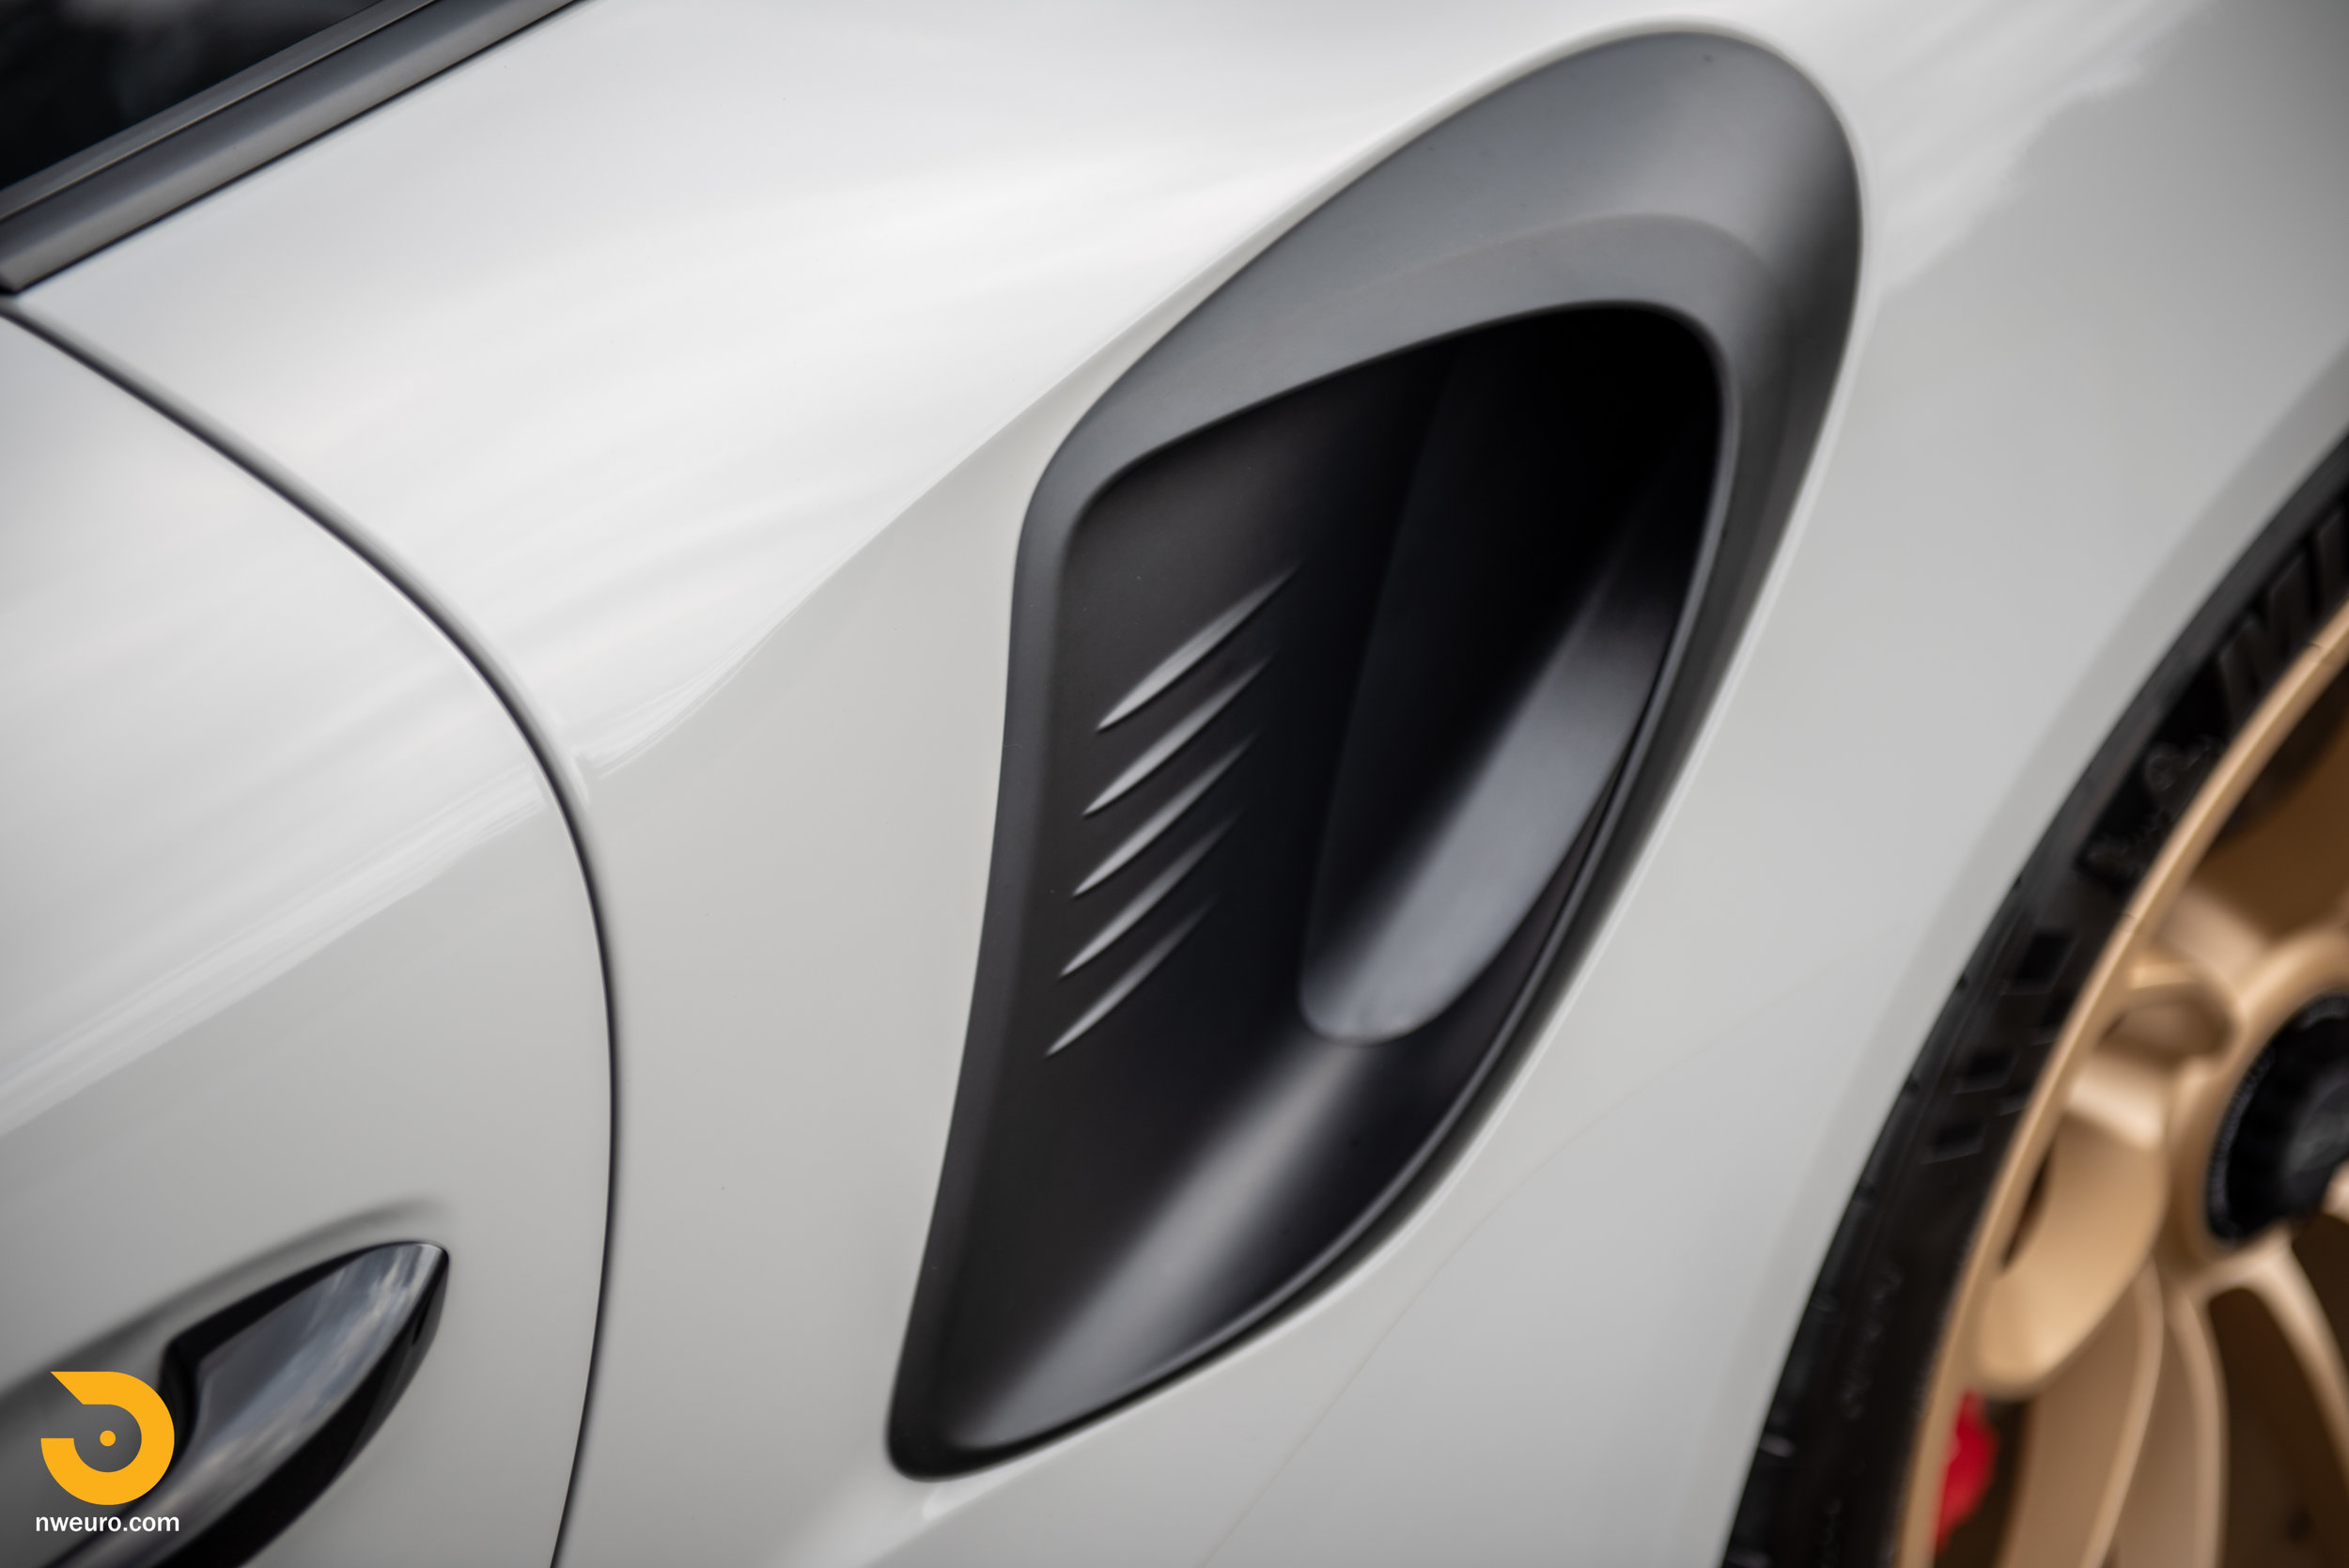 2019 Porsche GT3 RS - Chalk-25.jpg